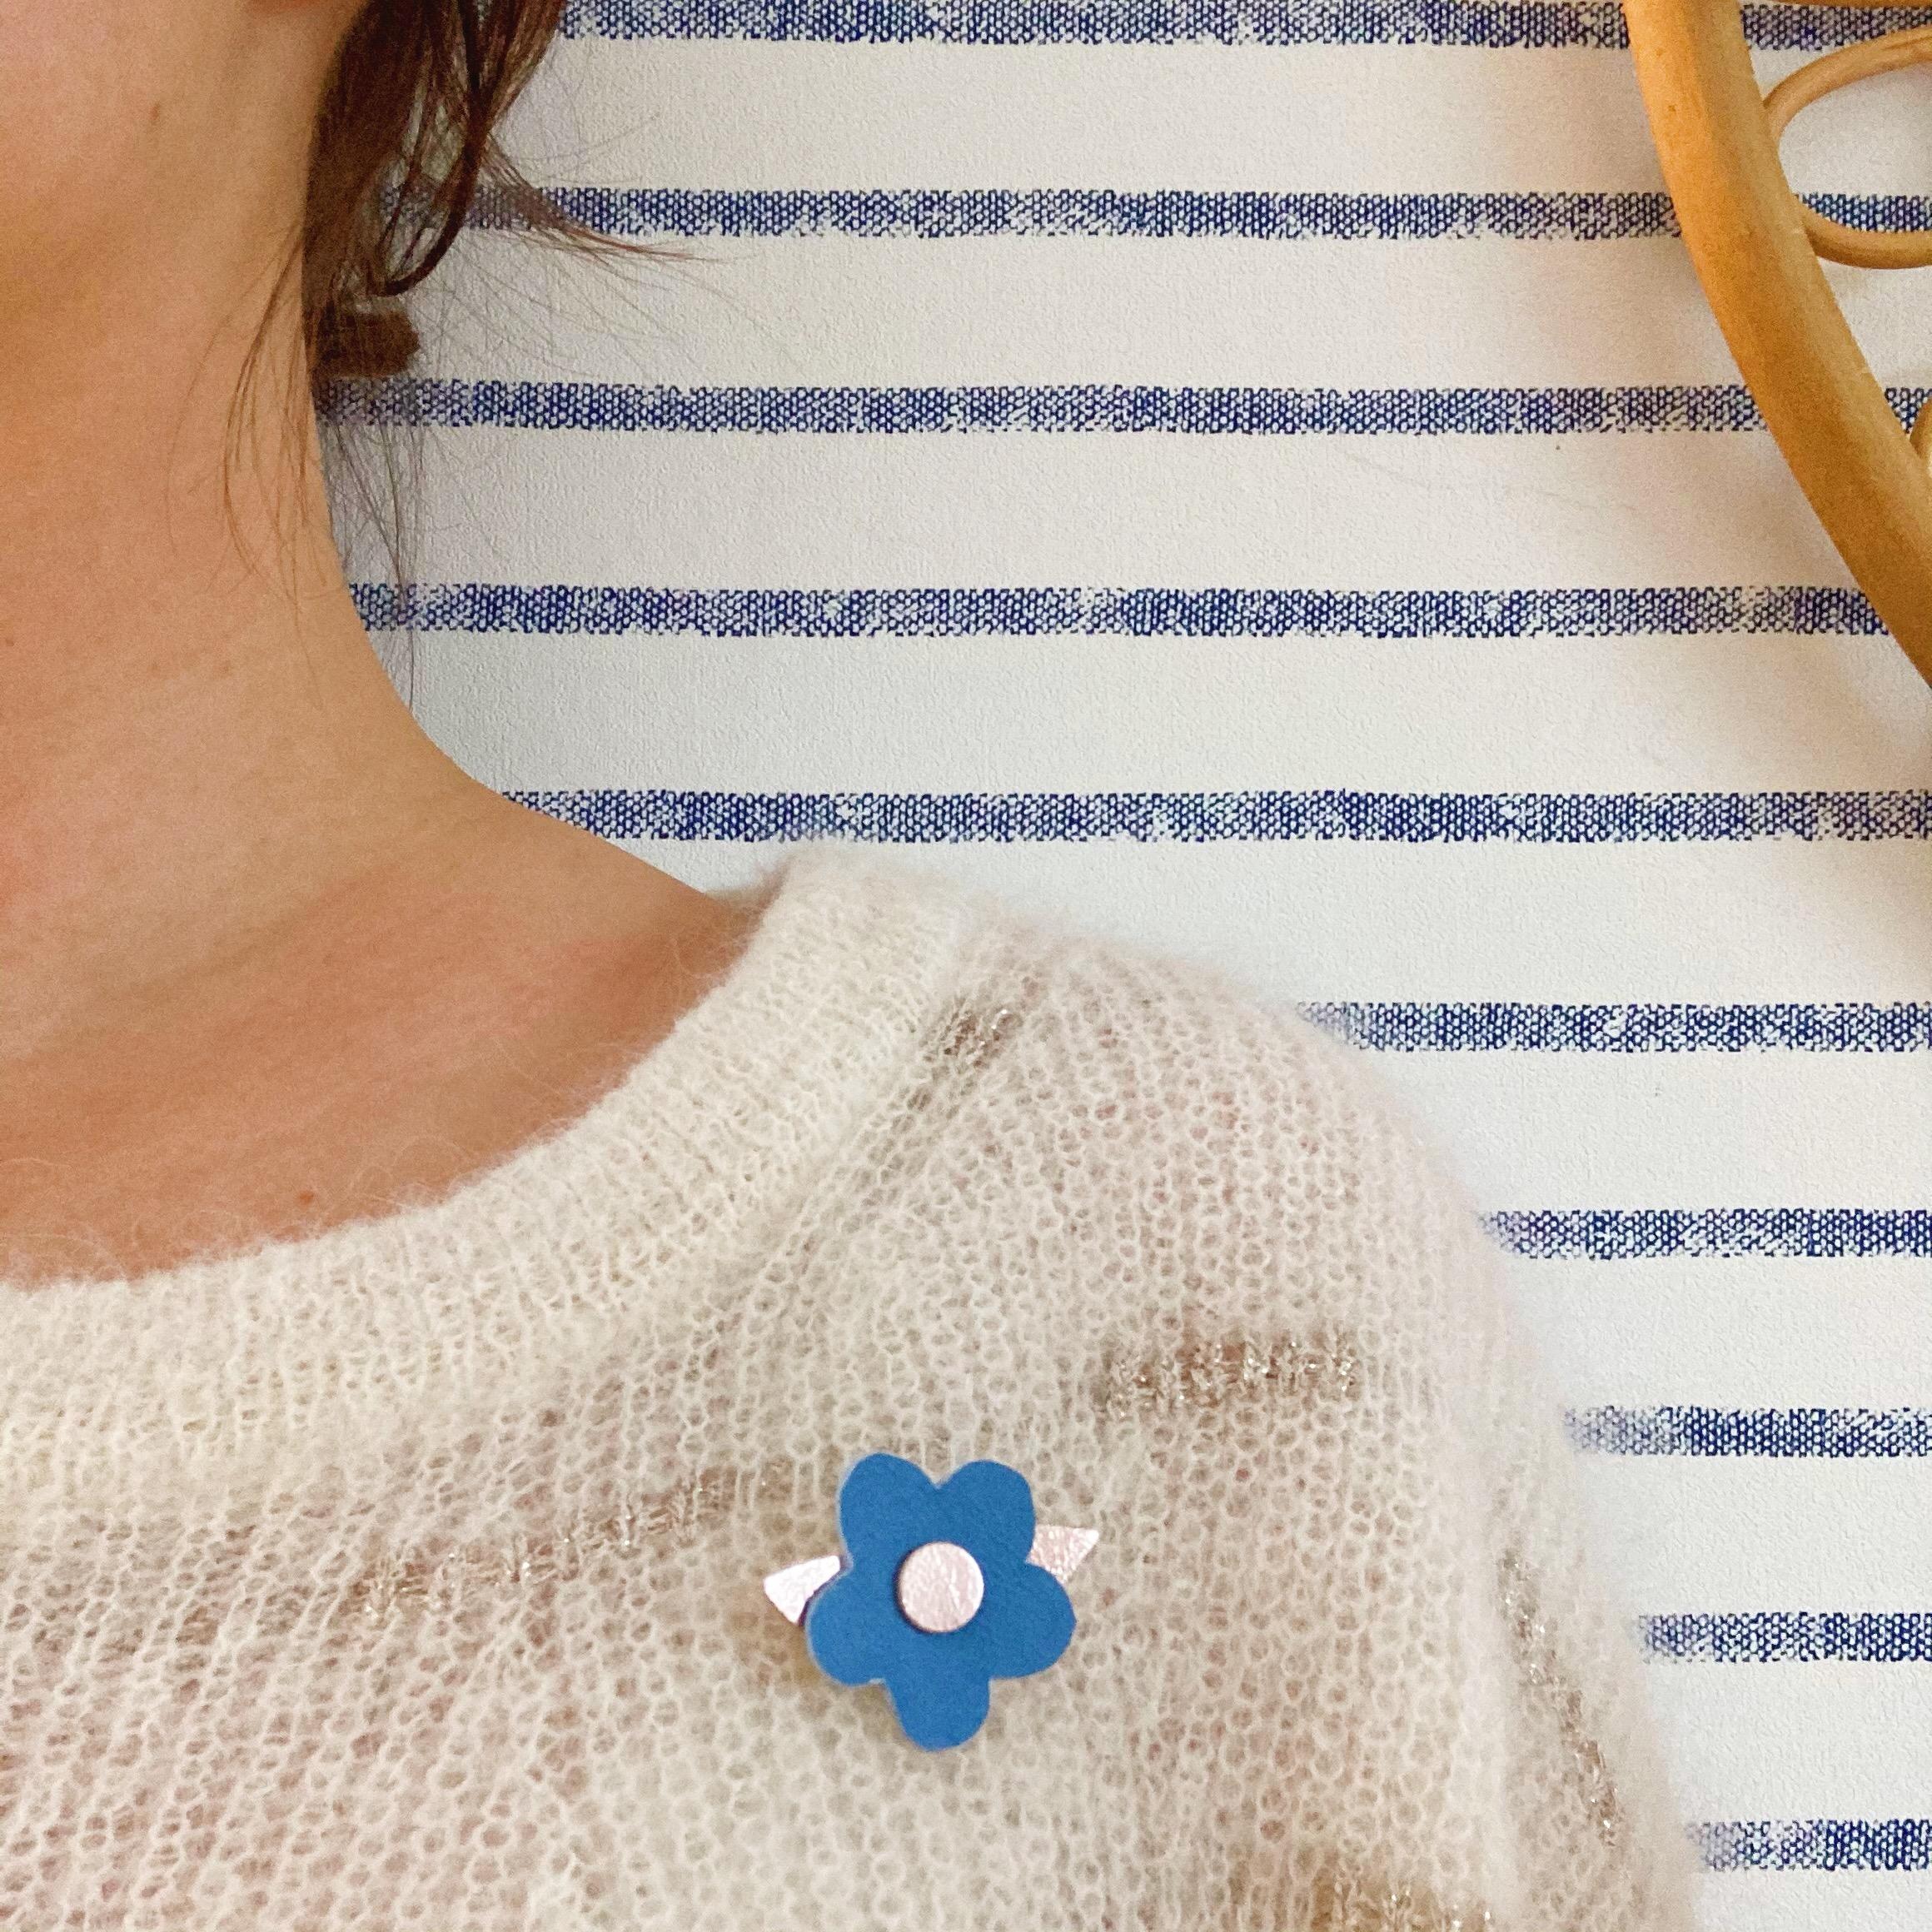 broche bijou fleur bleu hortensia en cuir made in france - du vent dans mes valises